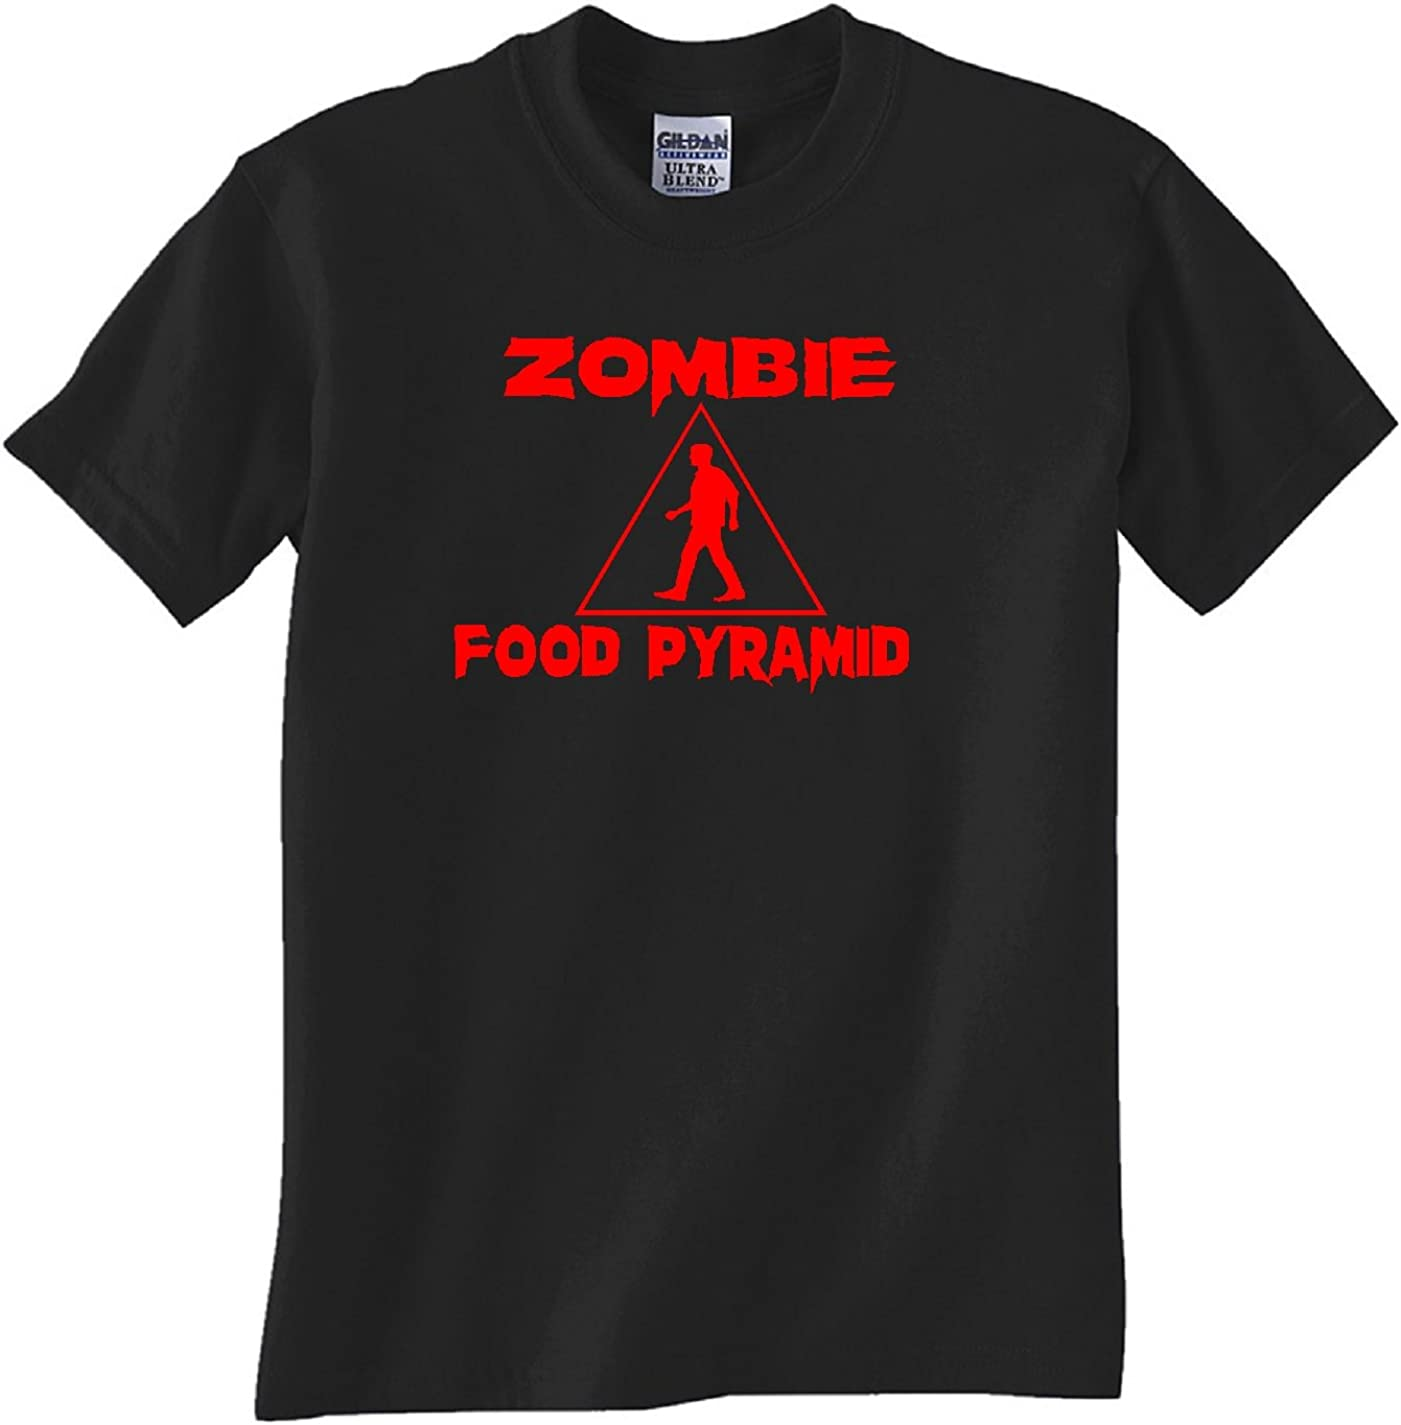 Zombie Food Pyramid Black T Shirt